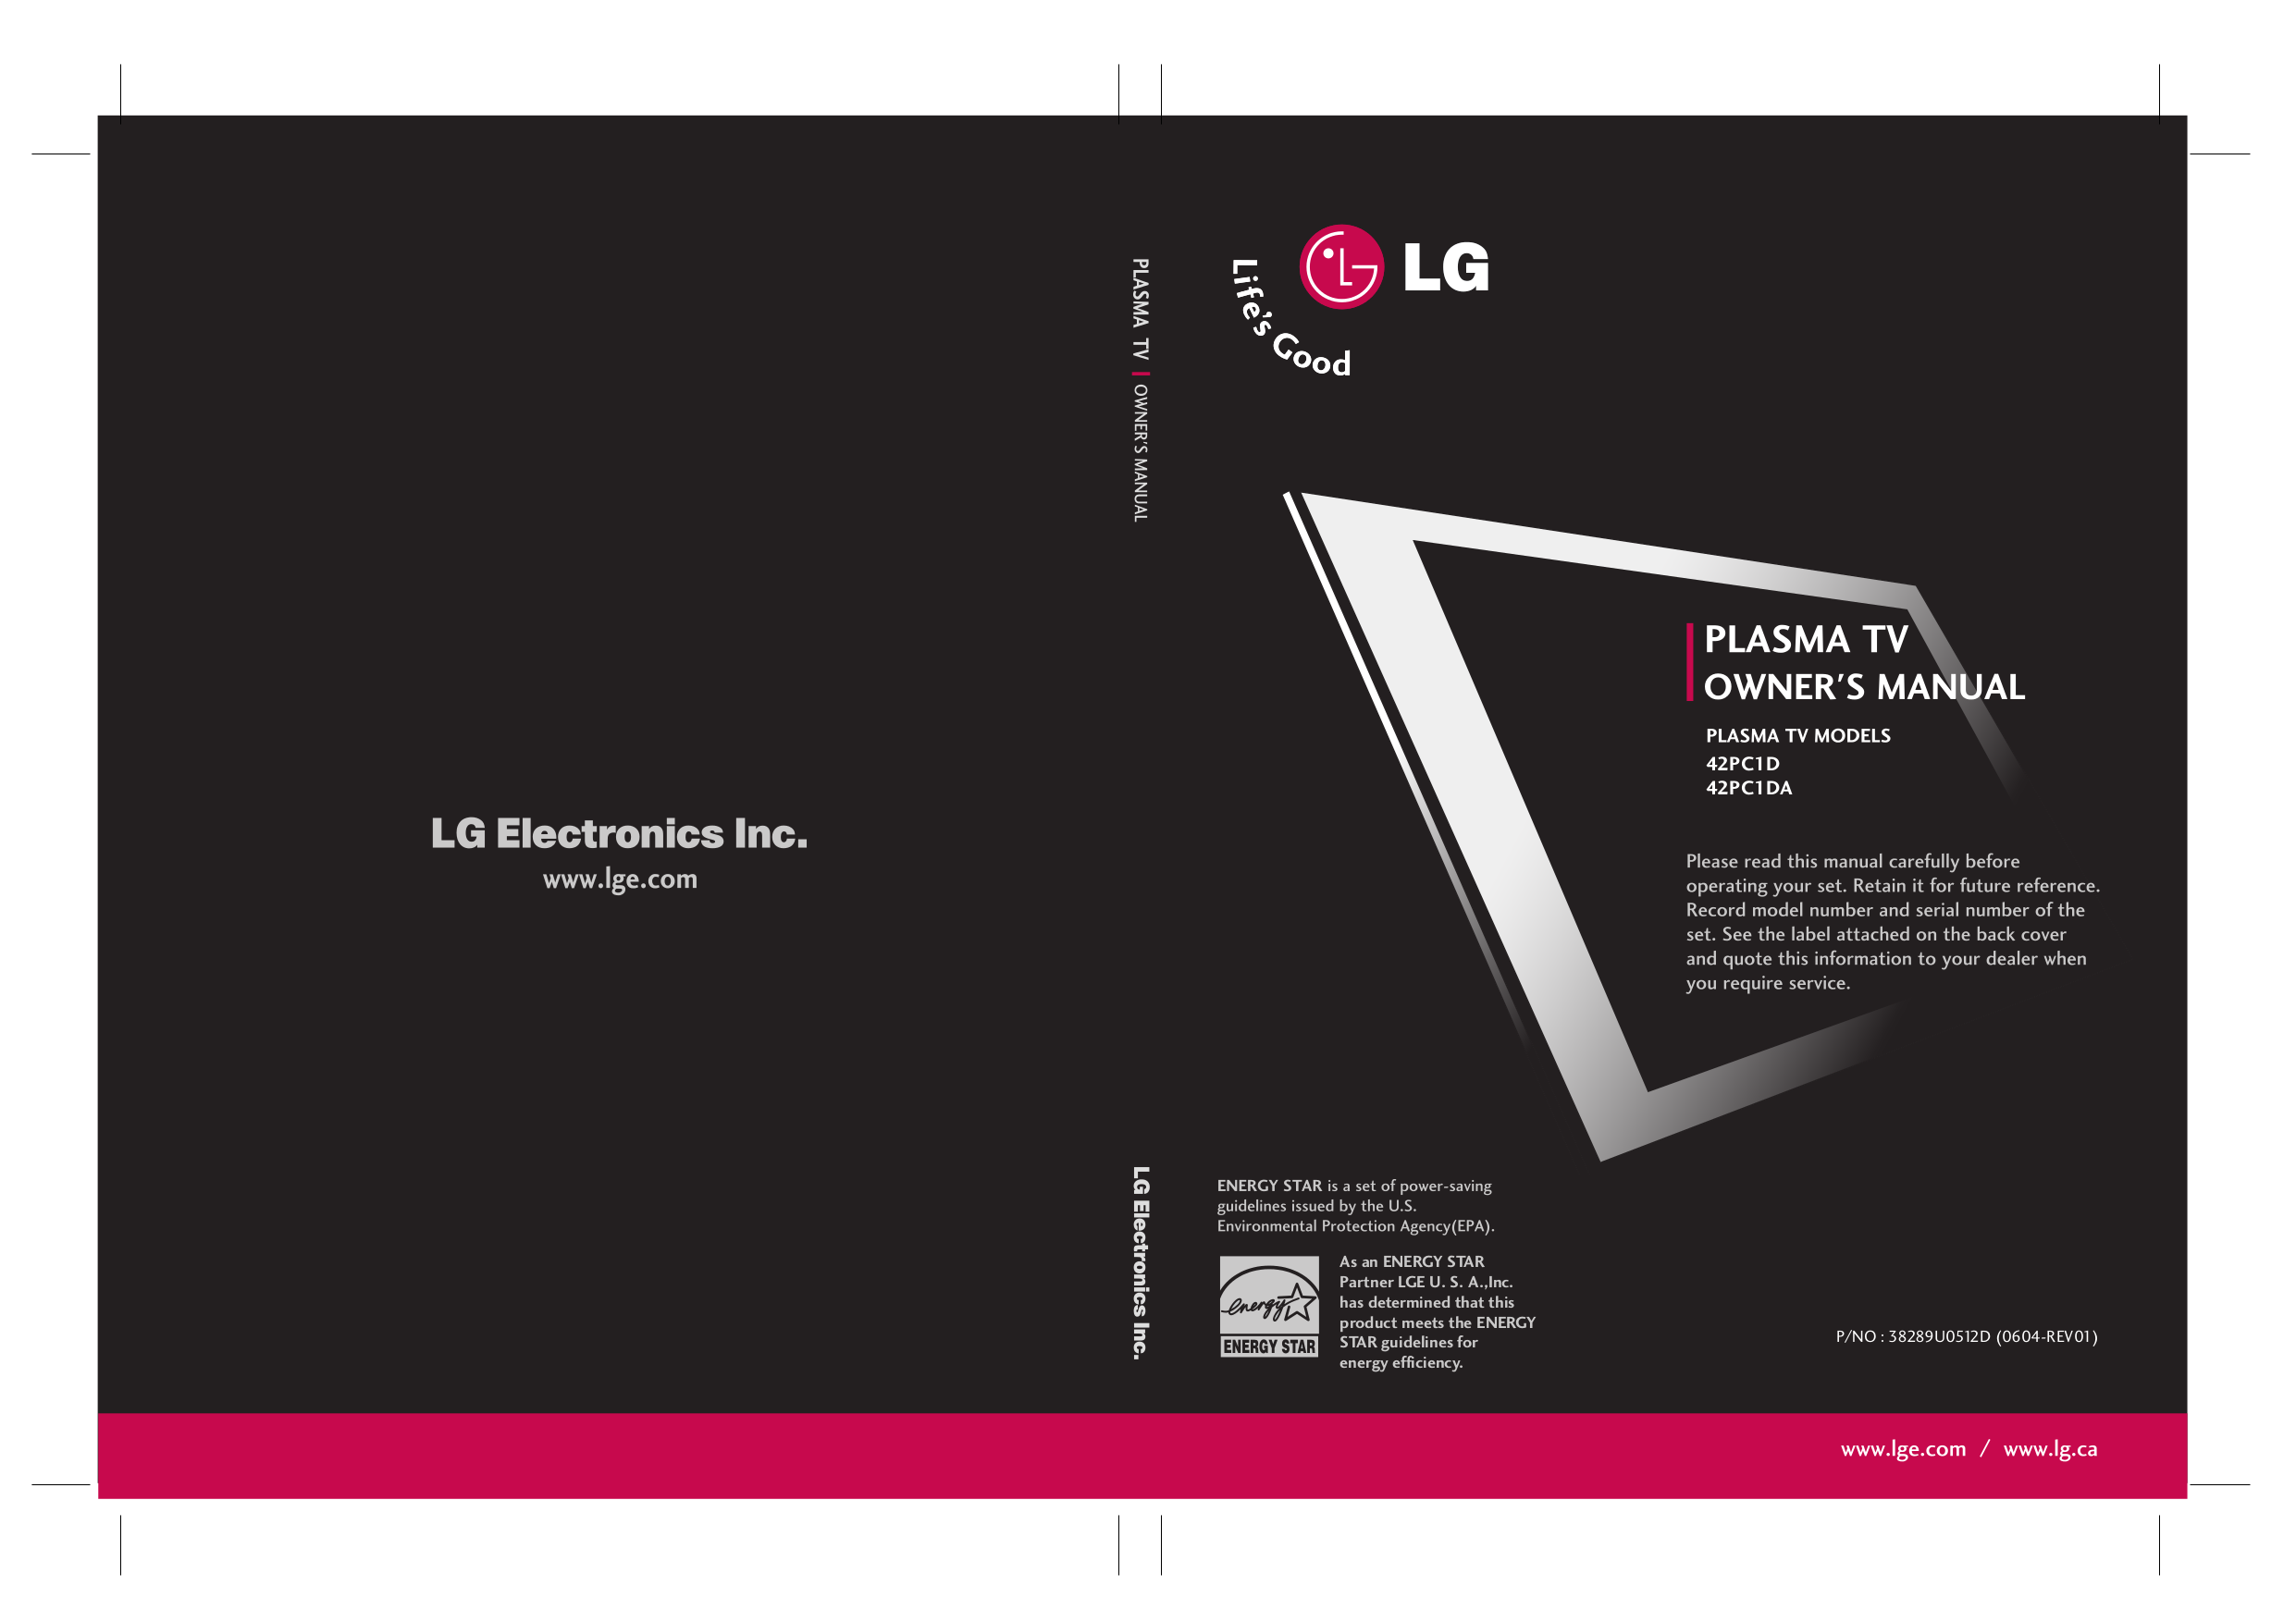 pdf for LG TV 42PC1DA manual